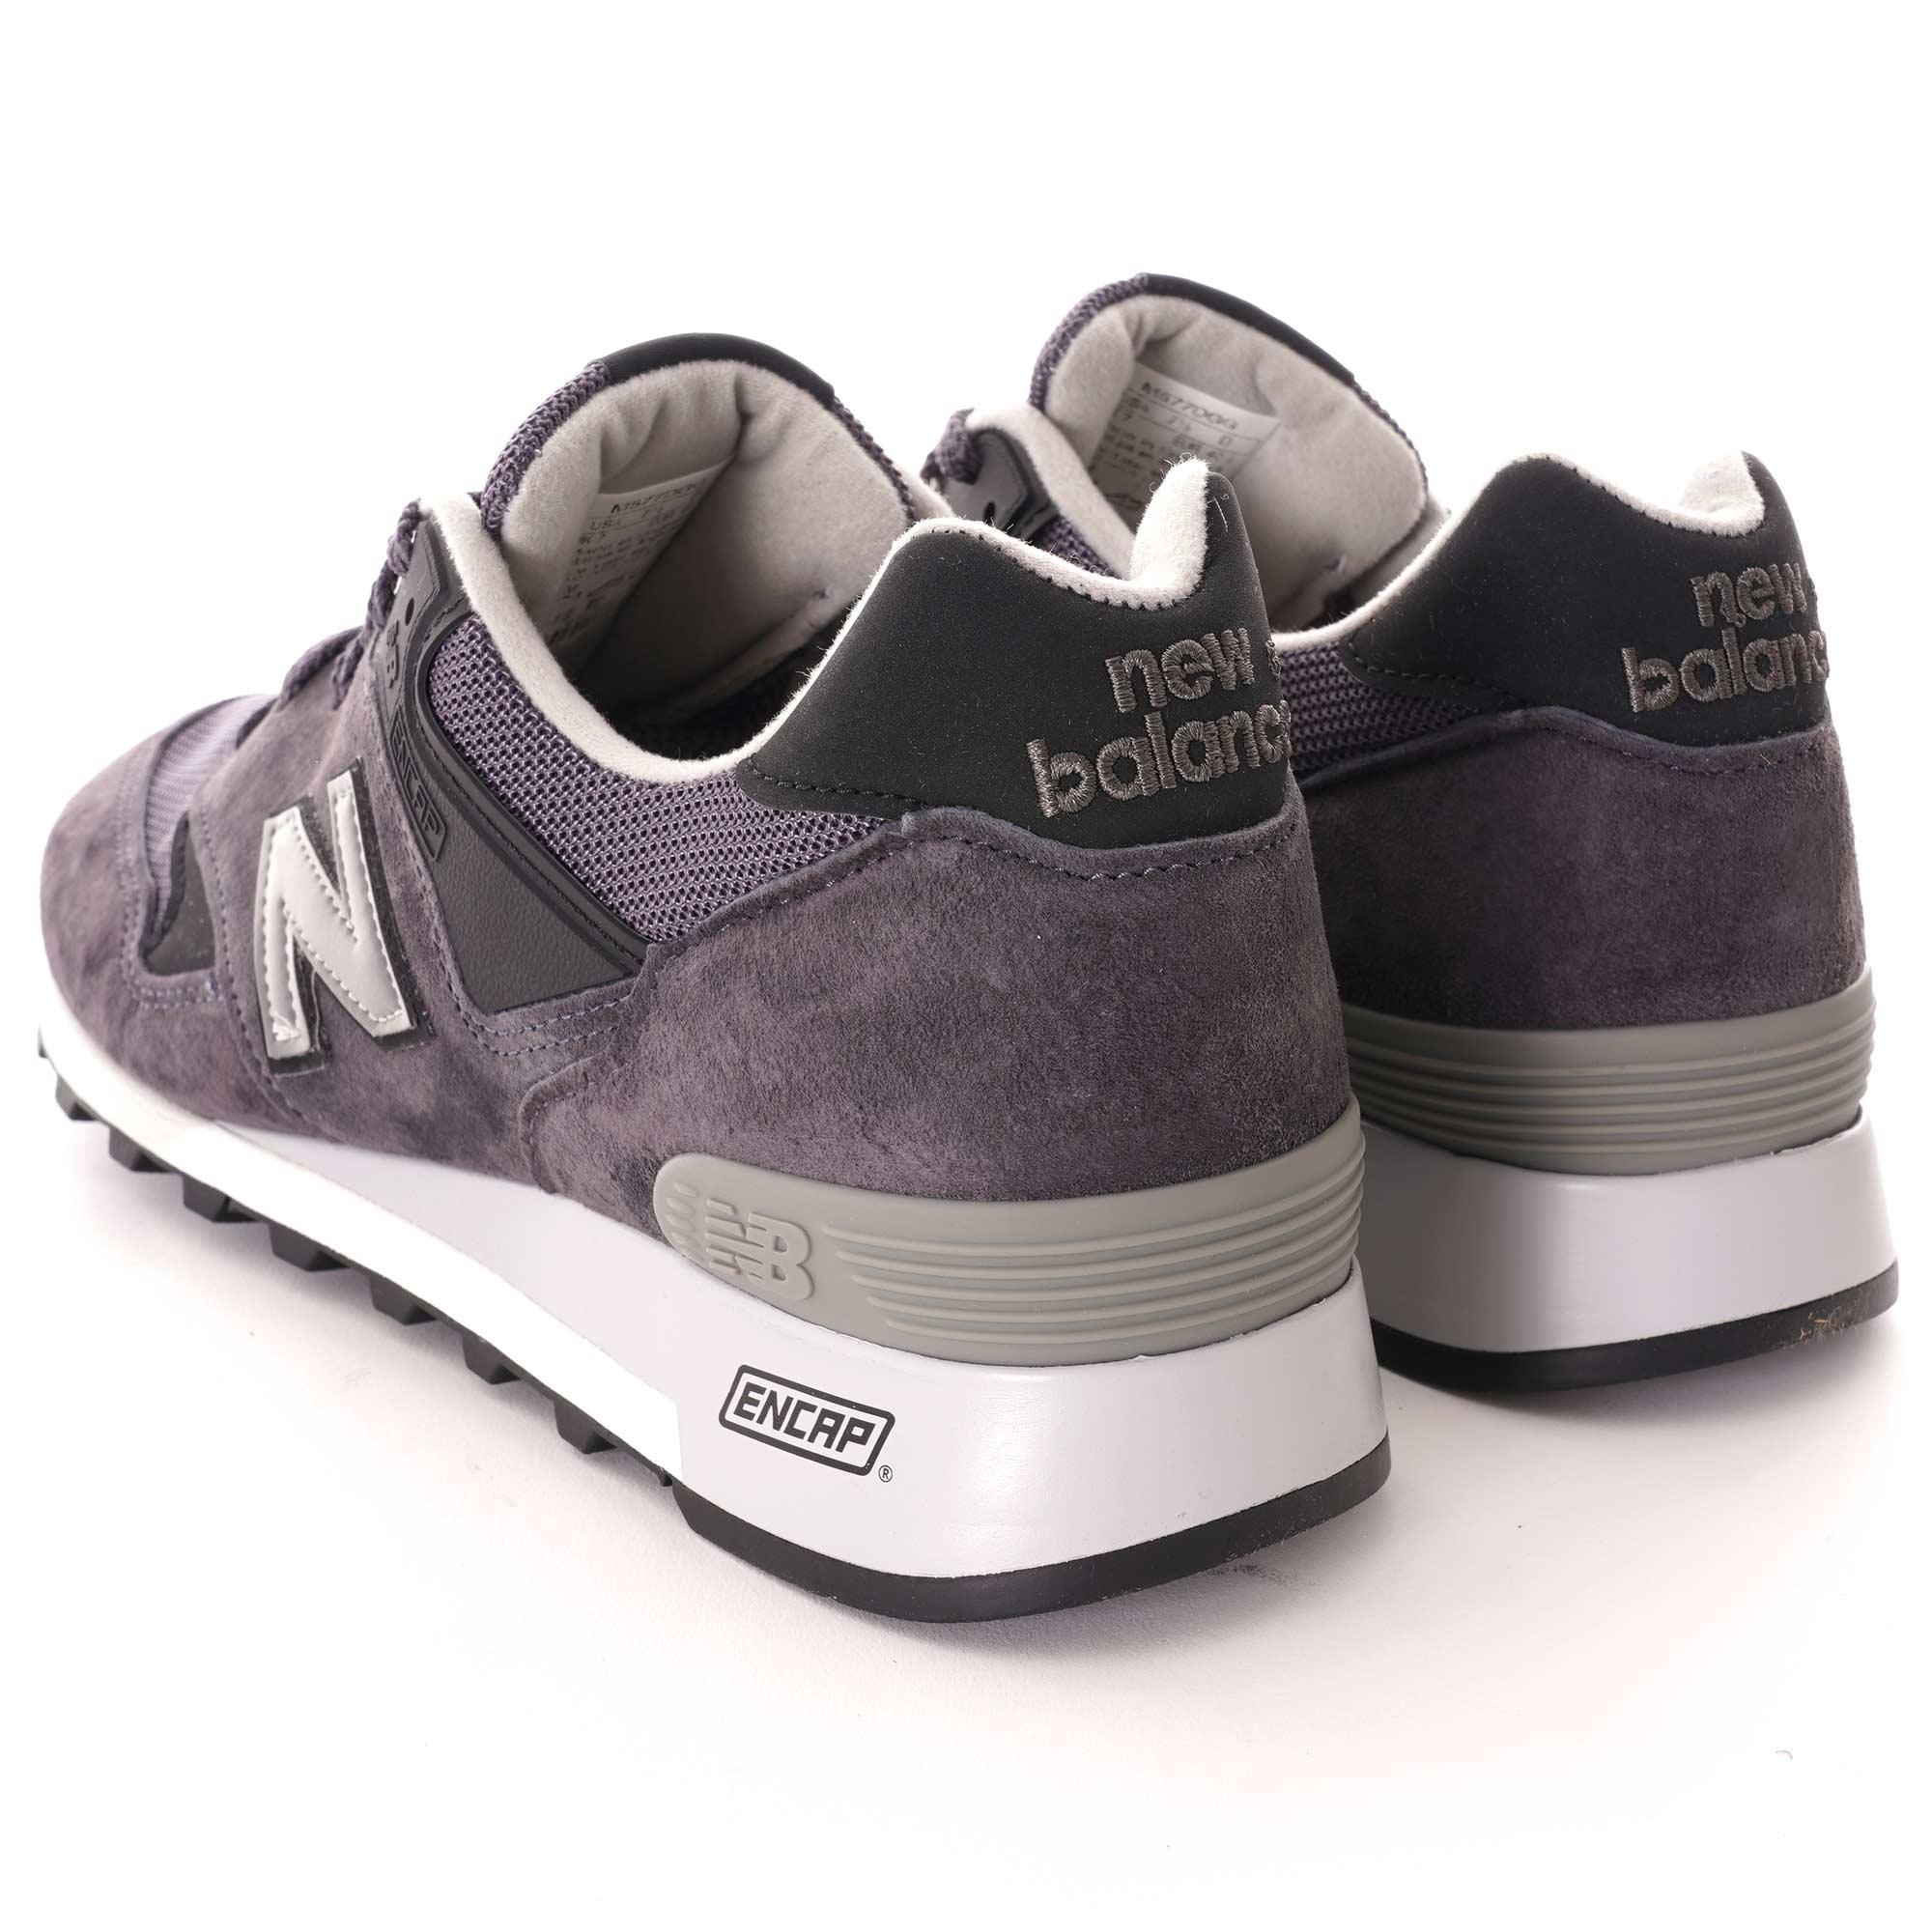 New Balance 577 Made In UK | Dark Grey